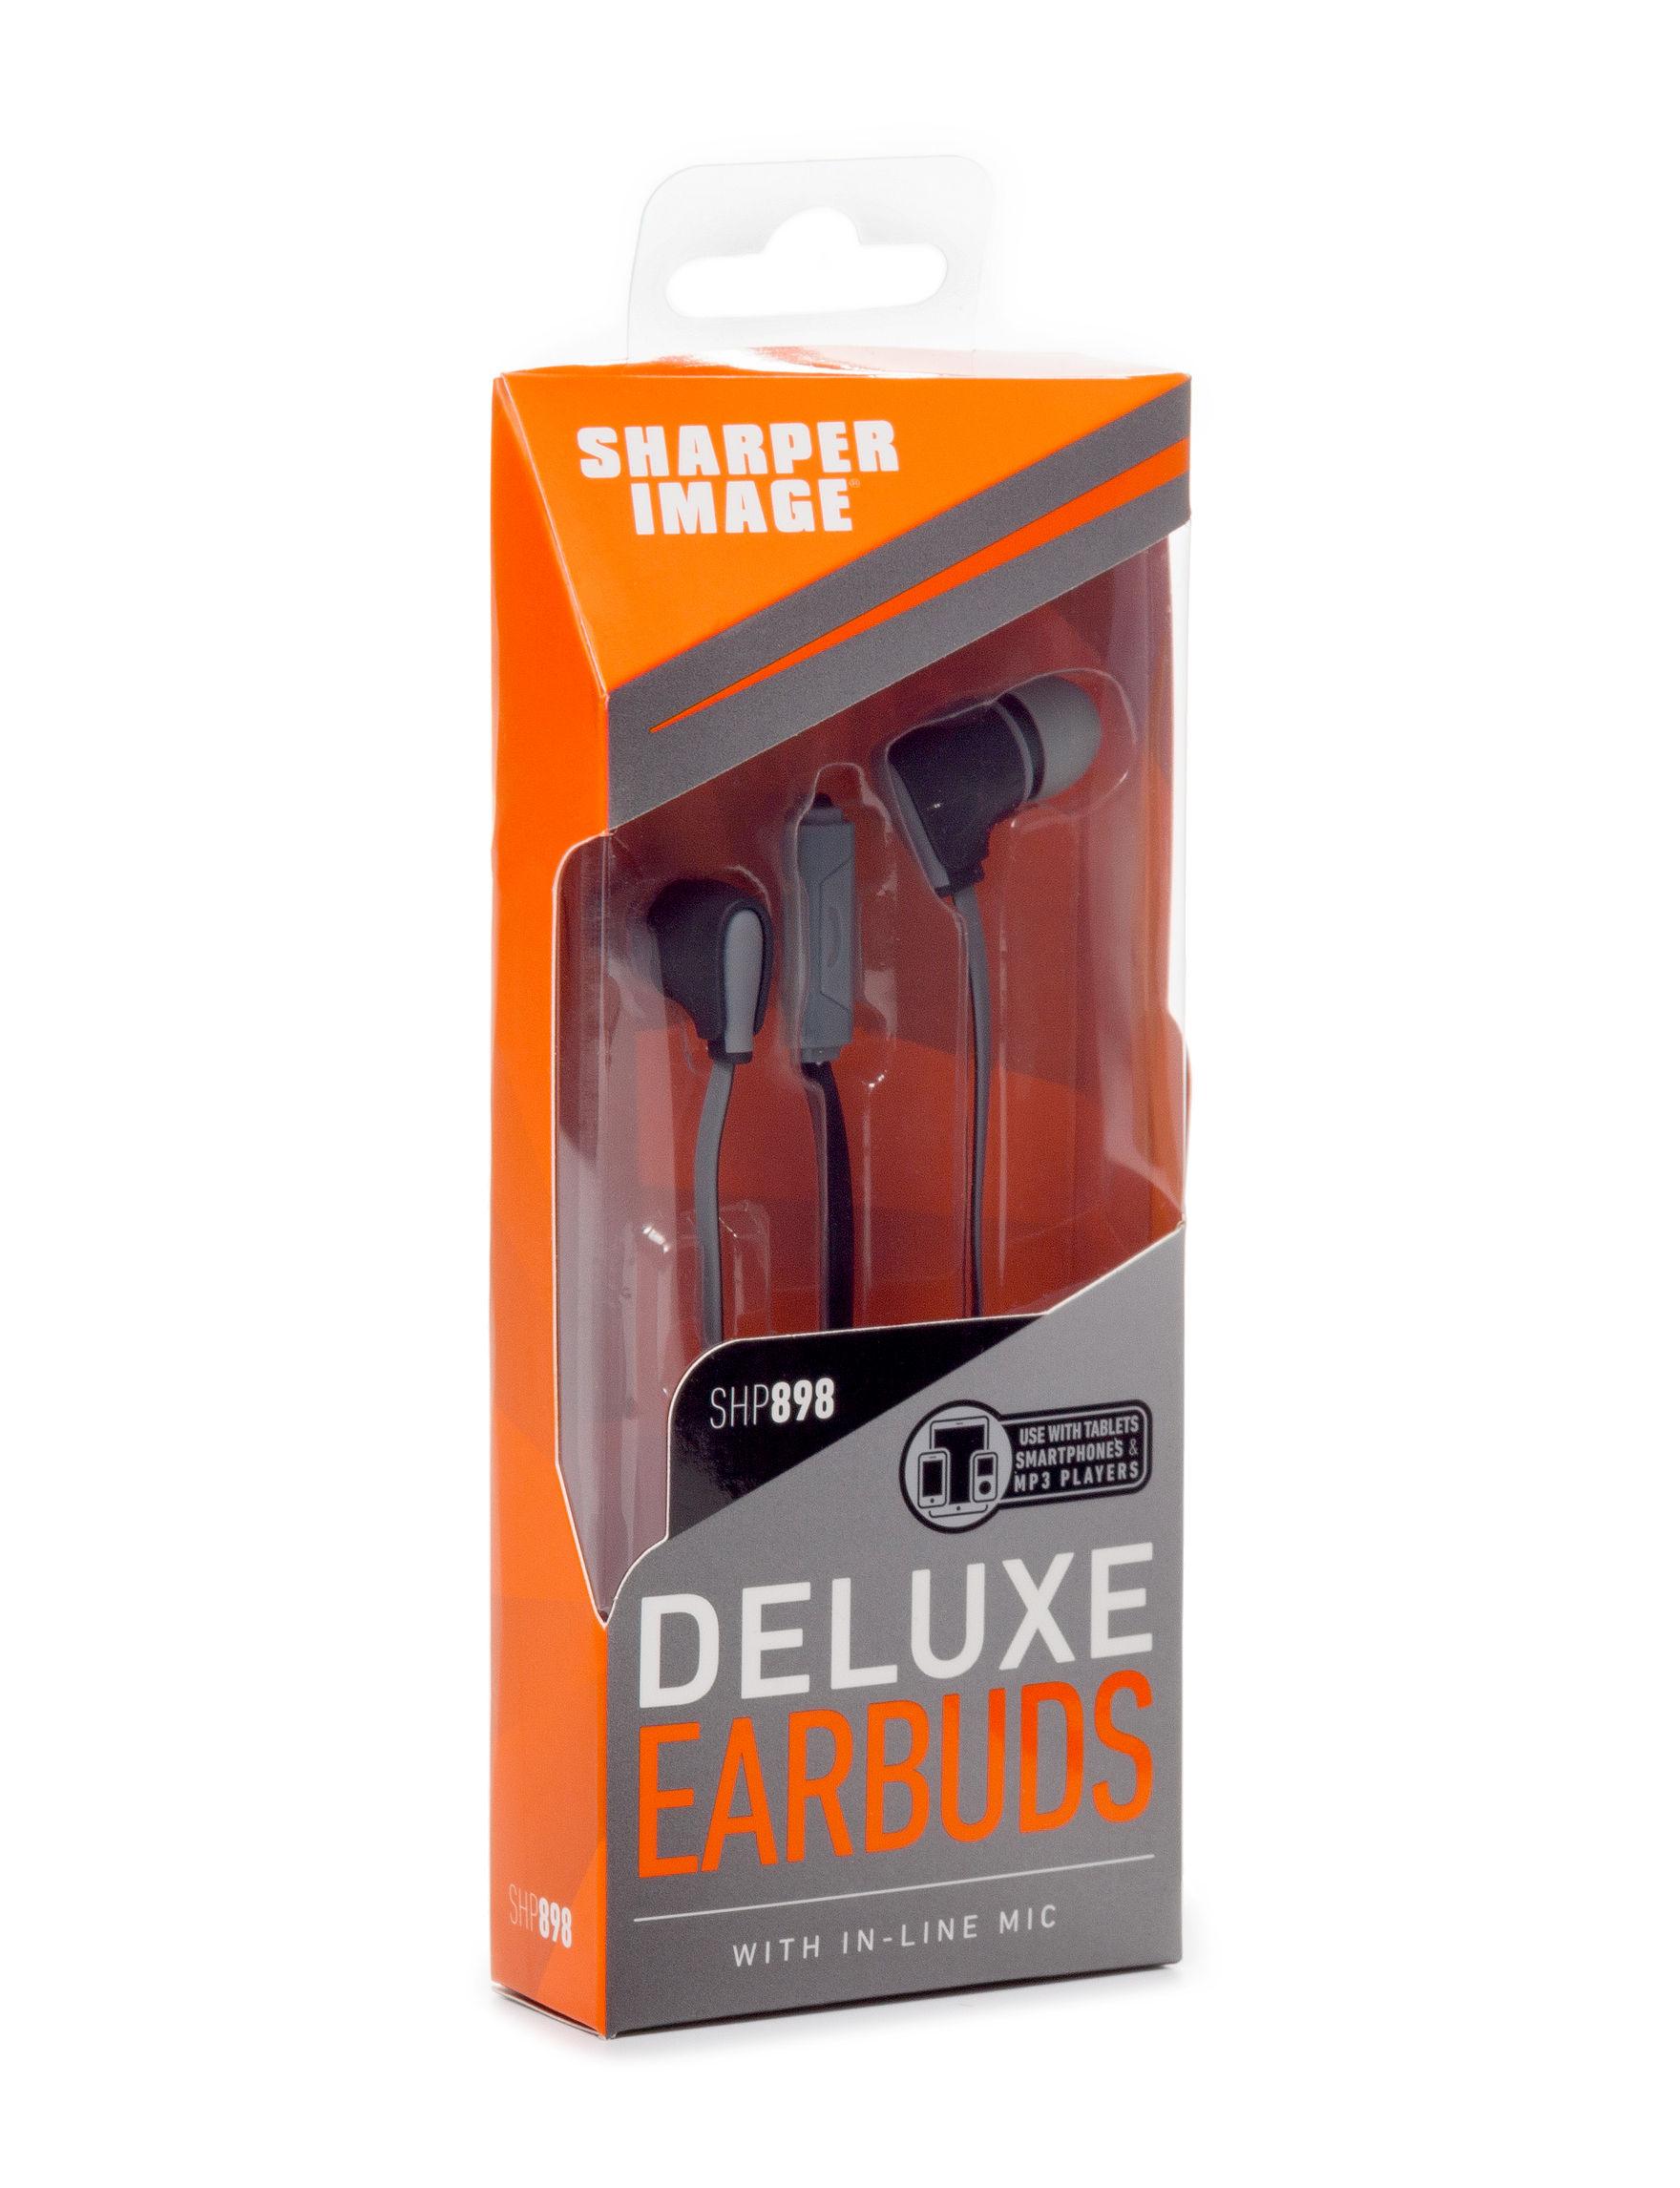 Sharper Image Black Headphones Home & Portable Audio Tech Accessories Travel Accessories